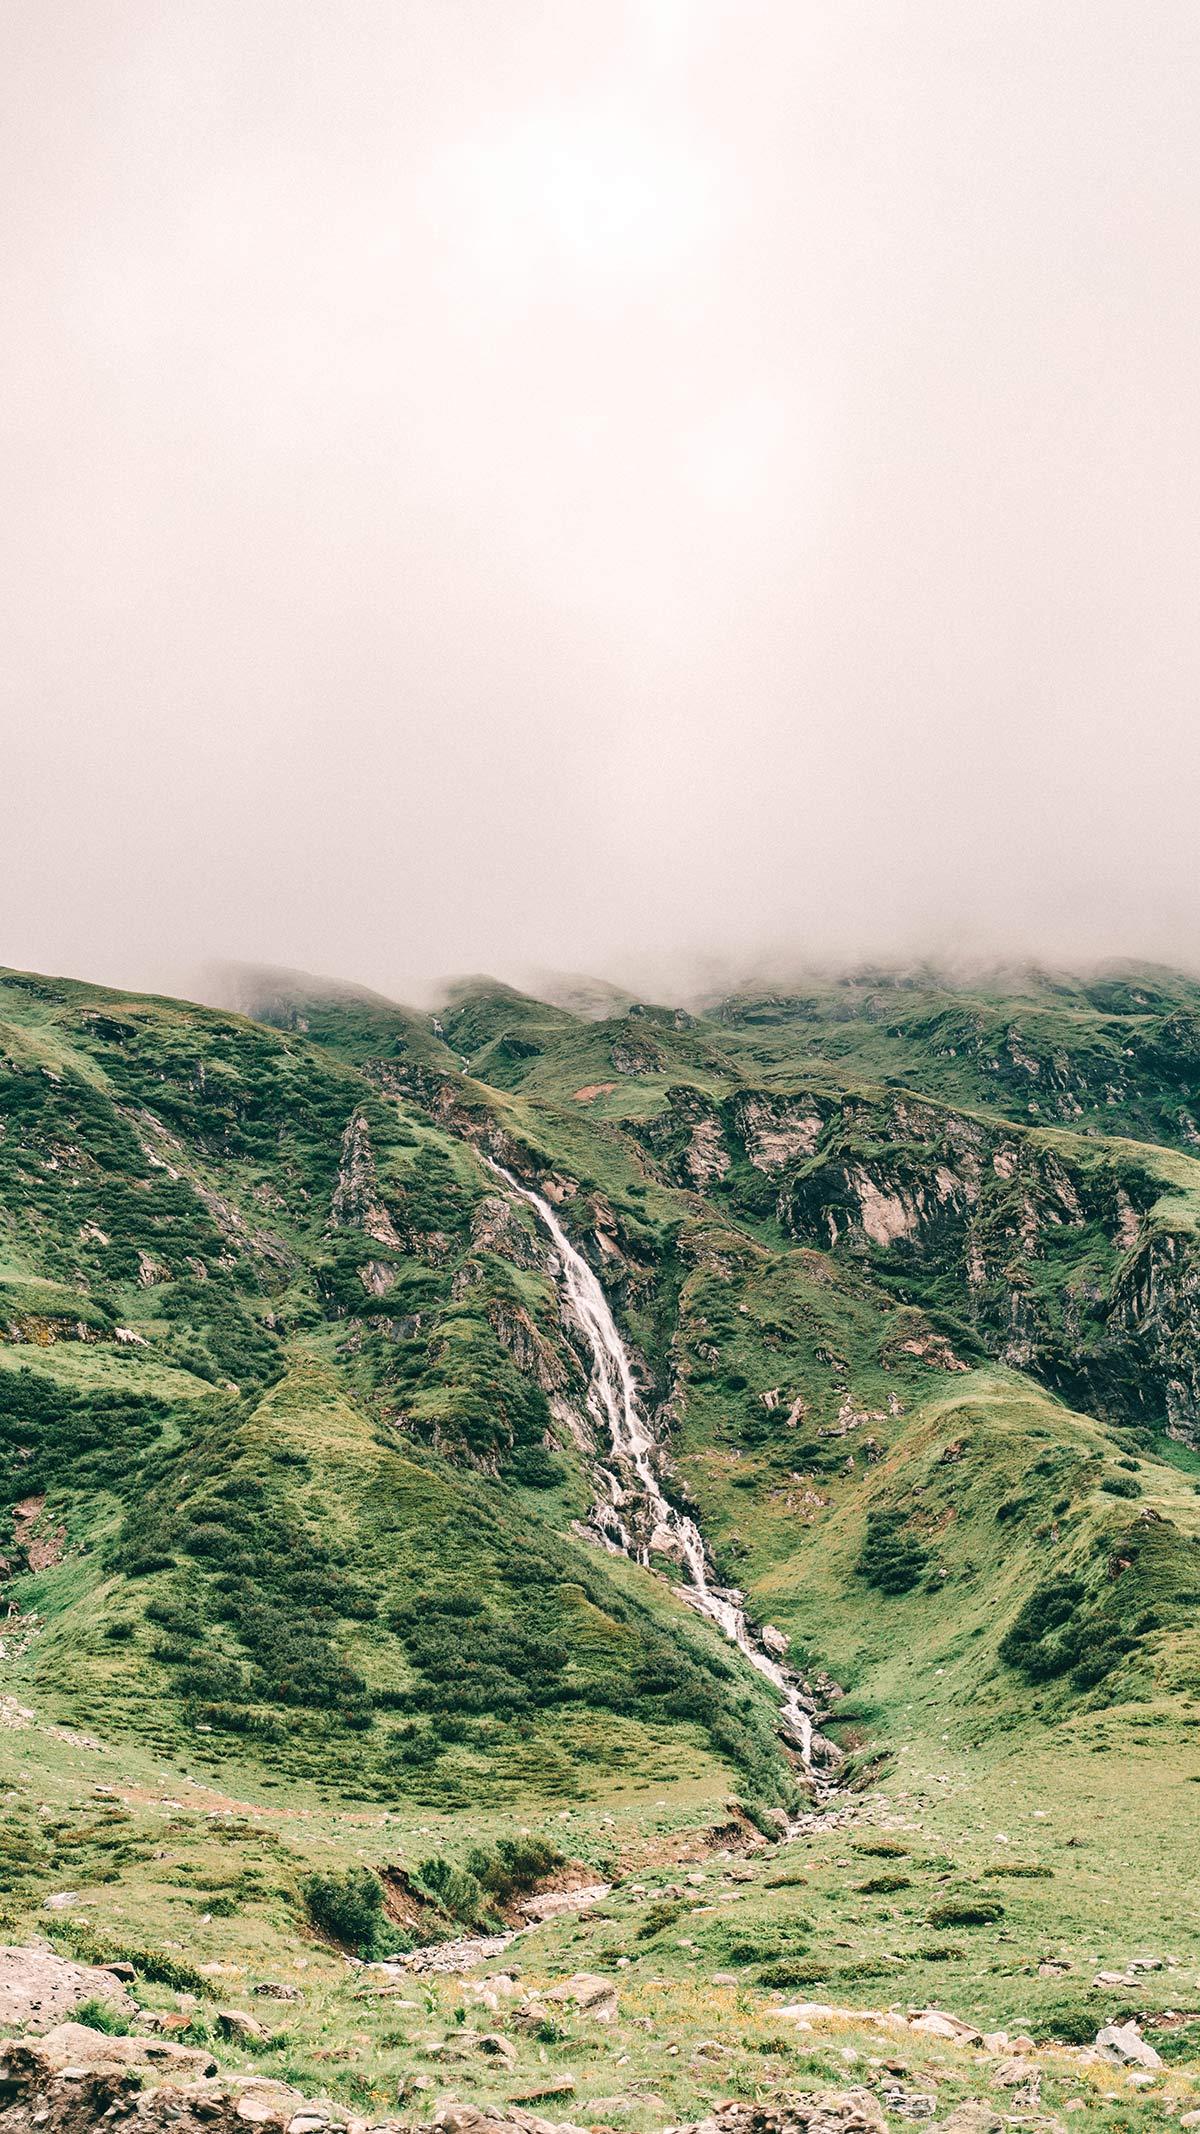 Wasserfall Hochgebirgsstausee